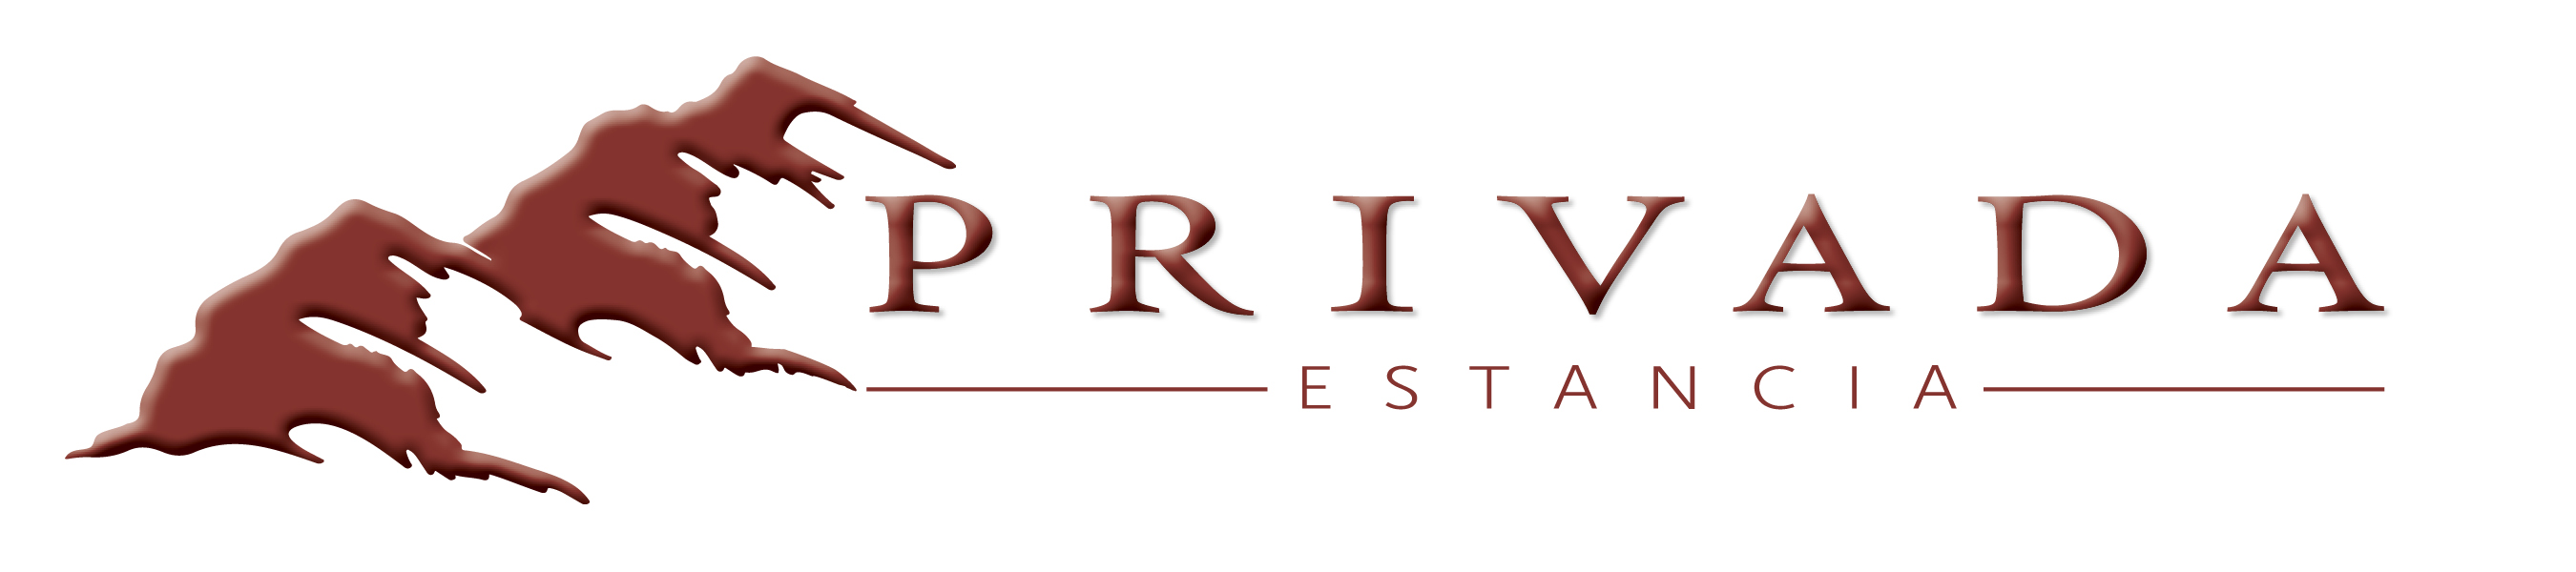 Privada Estancia - East Boise New Luxury Community